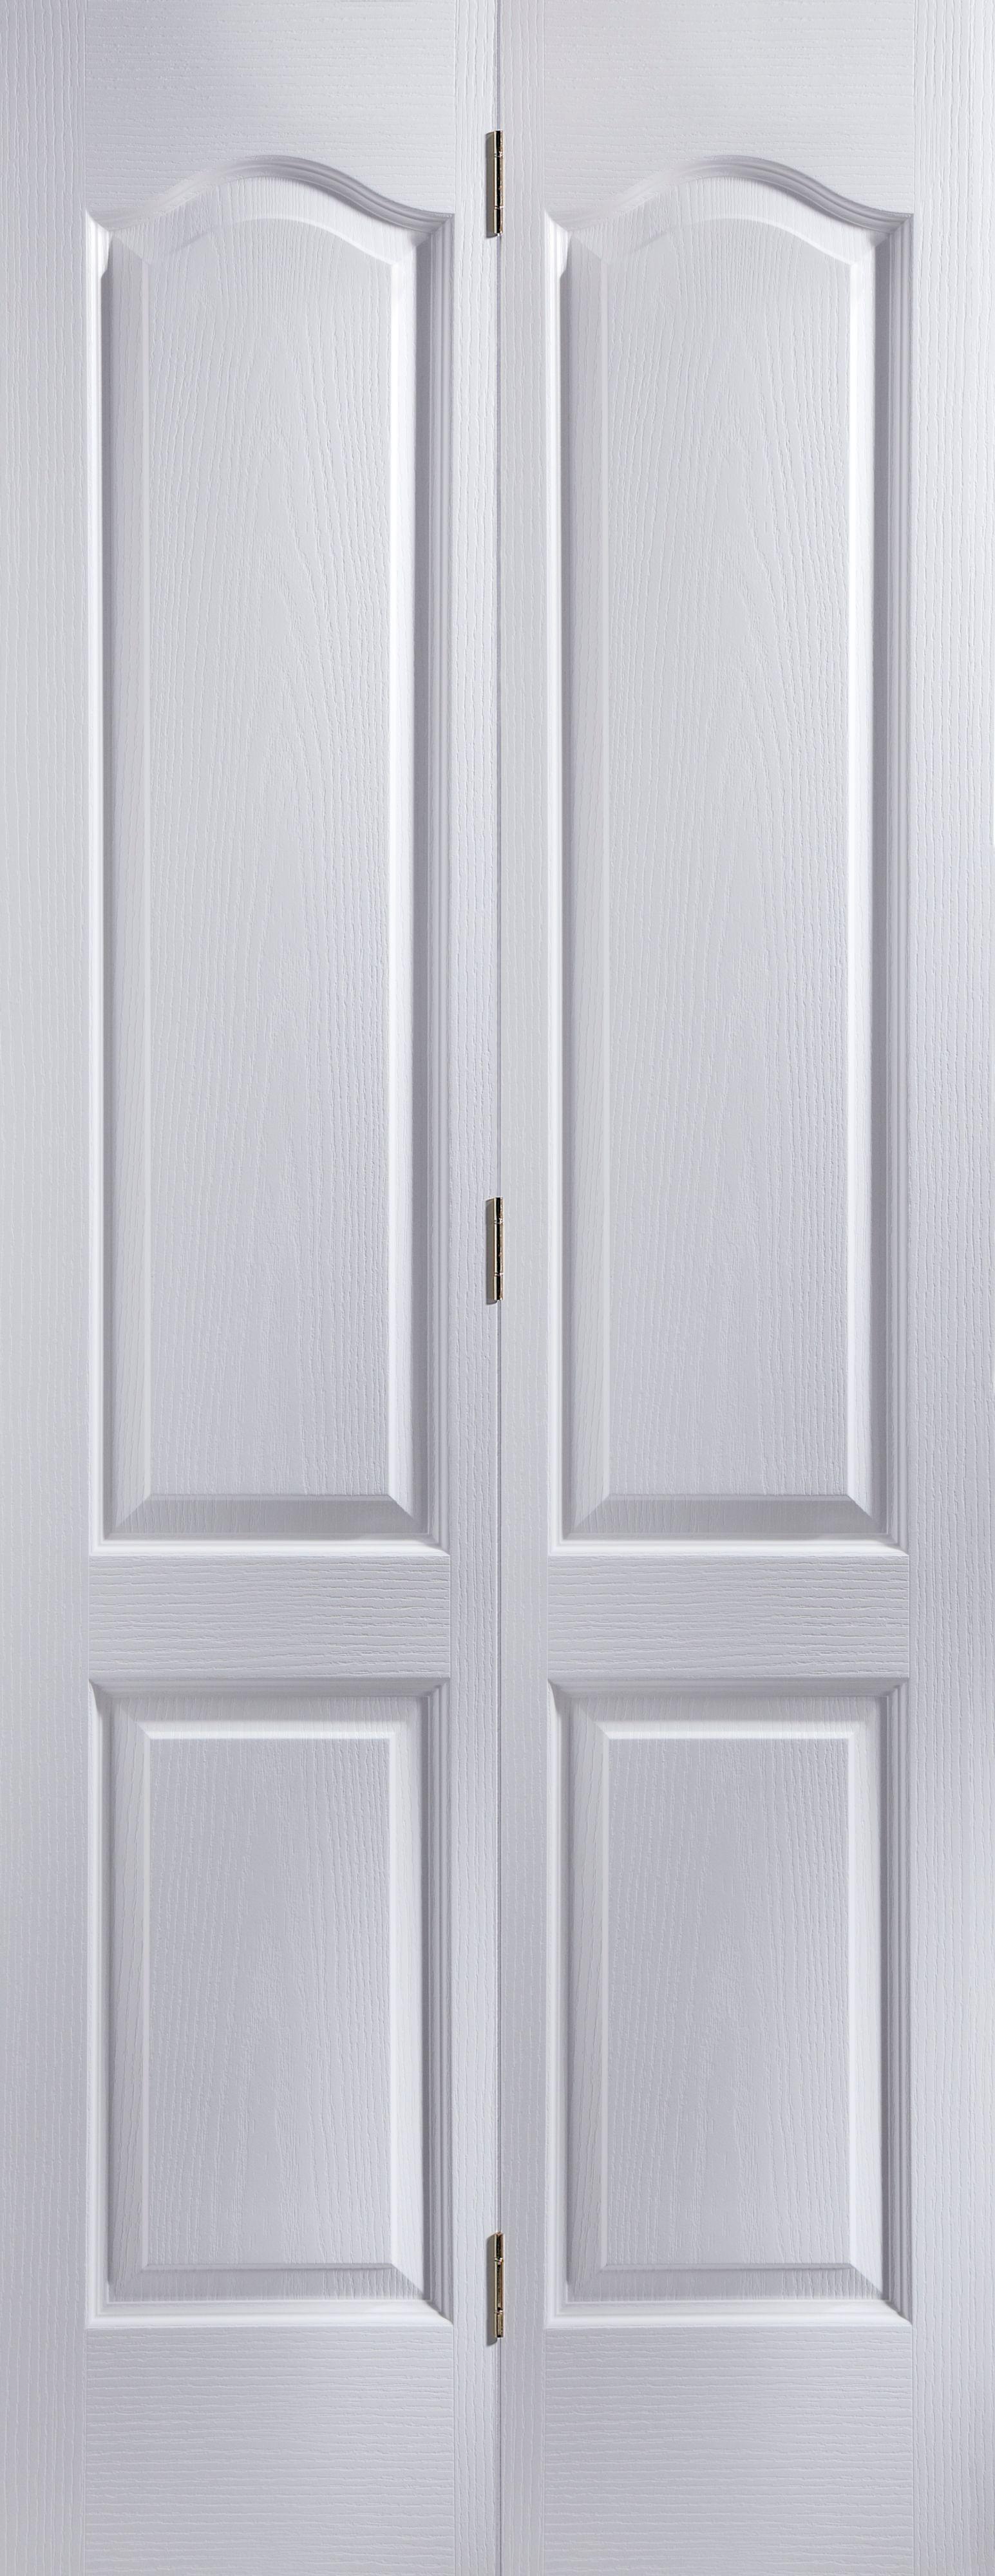 4 Panel Primed Woodgrain Effect Unglazed Internal Bi-fold Door, (h)1950mm (w)595mm